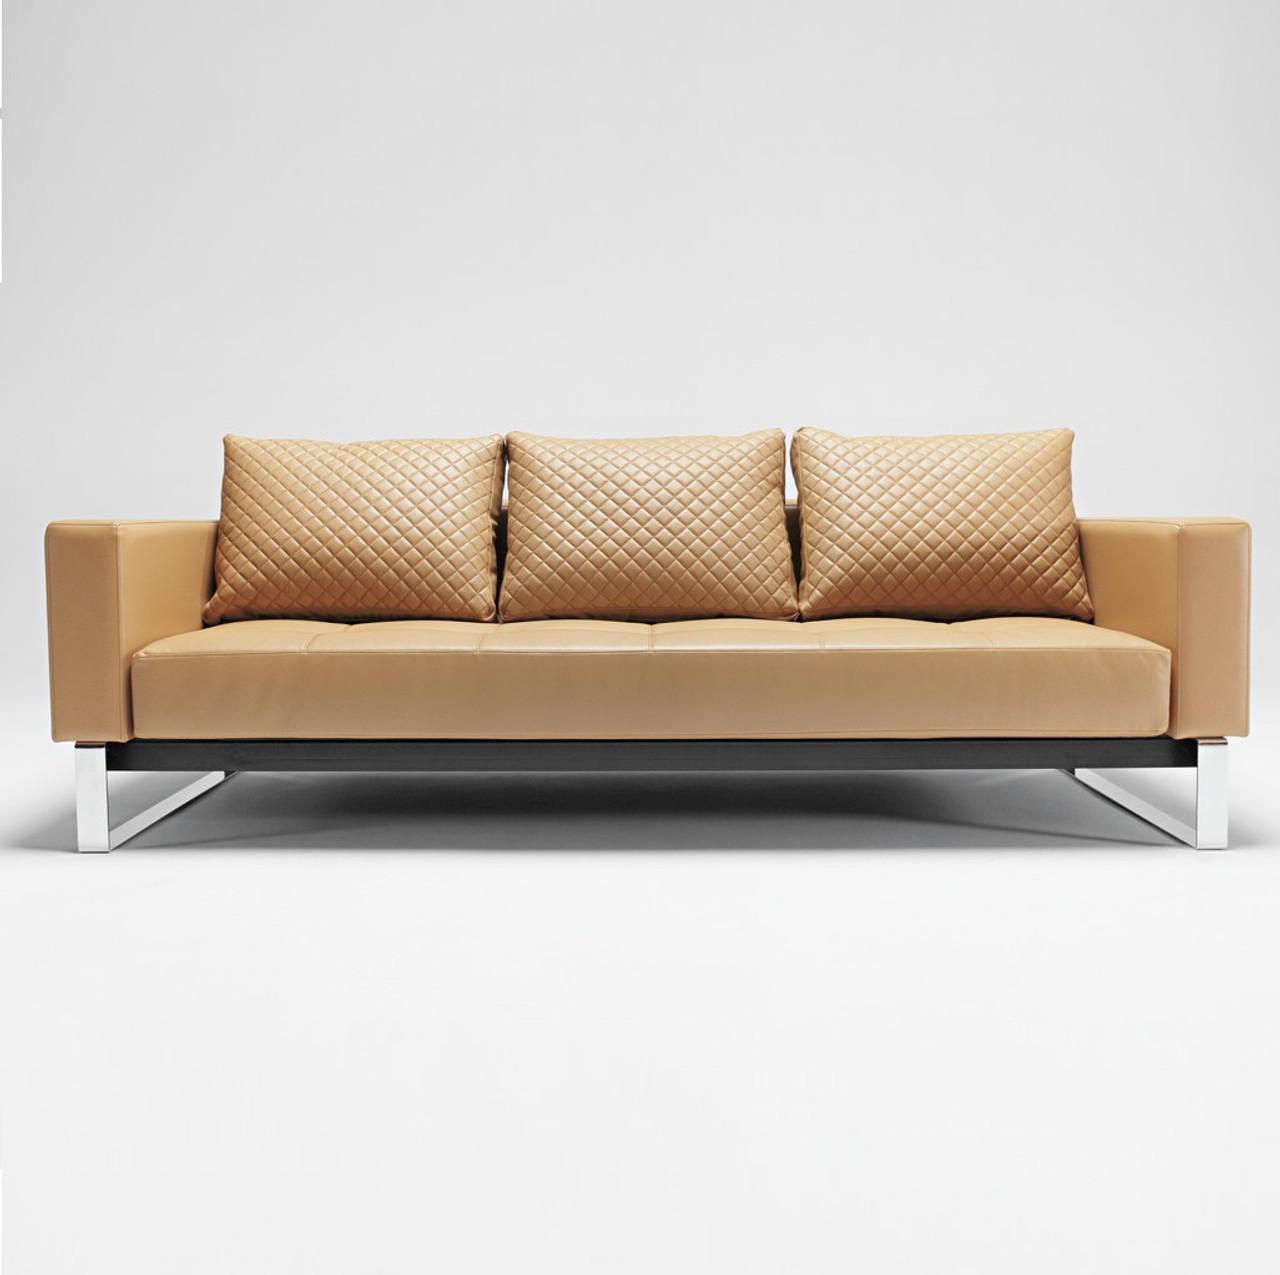 leather sleeper sofa. Cassius Q Deluxe Tan Leather Sleeper Sofa-Chrome Legs Sofa H